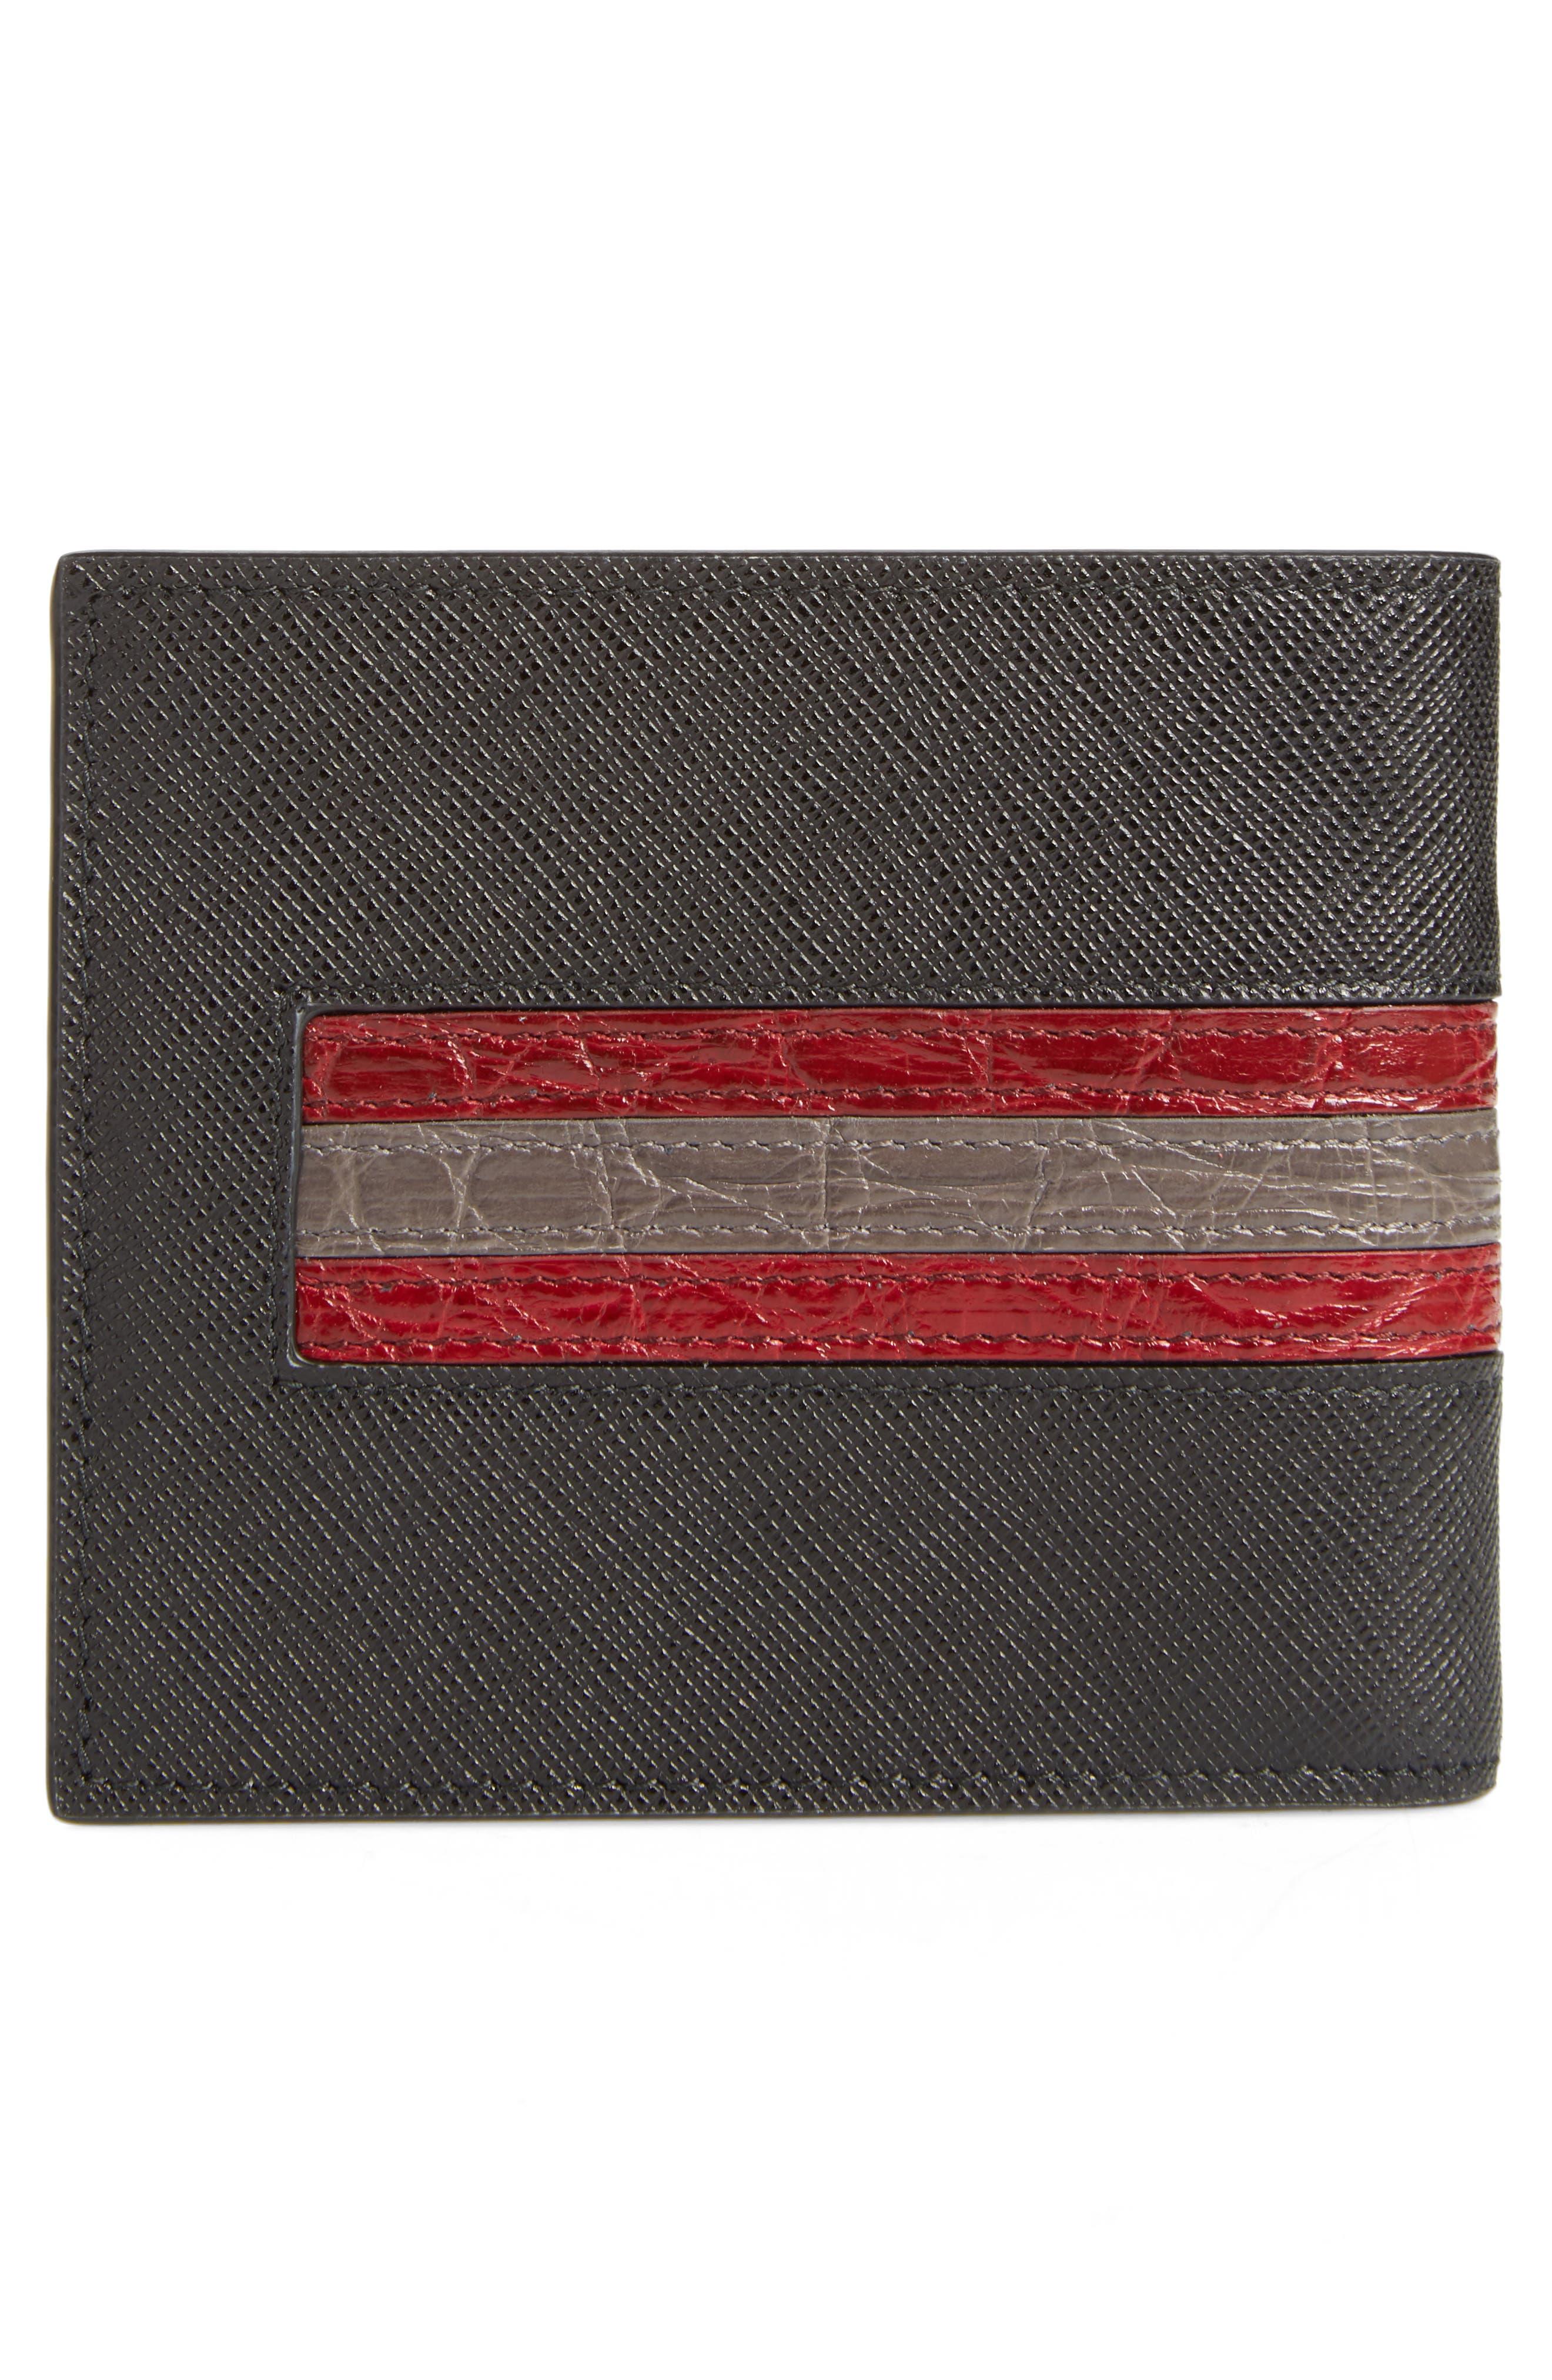 Alternate Image 3  - Prada Saffiano and Crocodile Leather Wallet